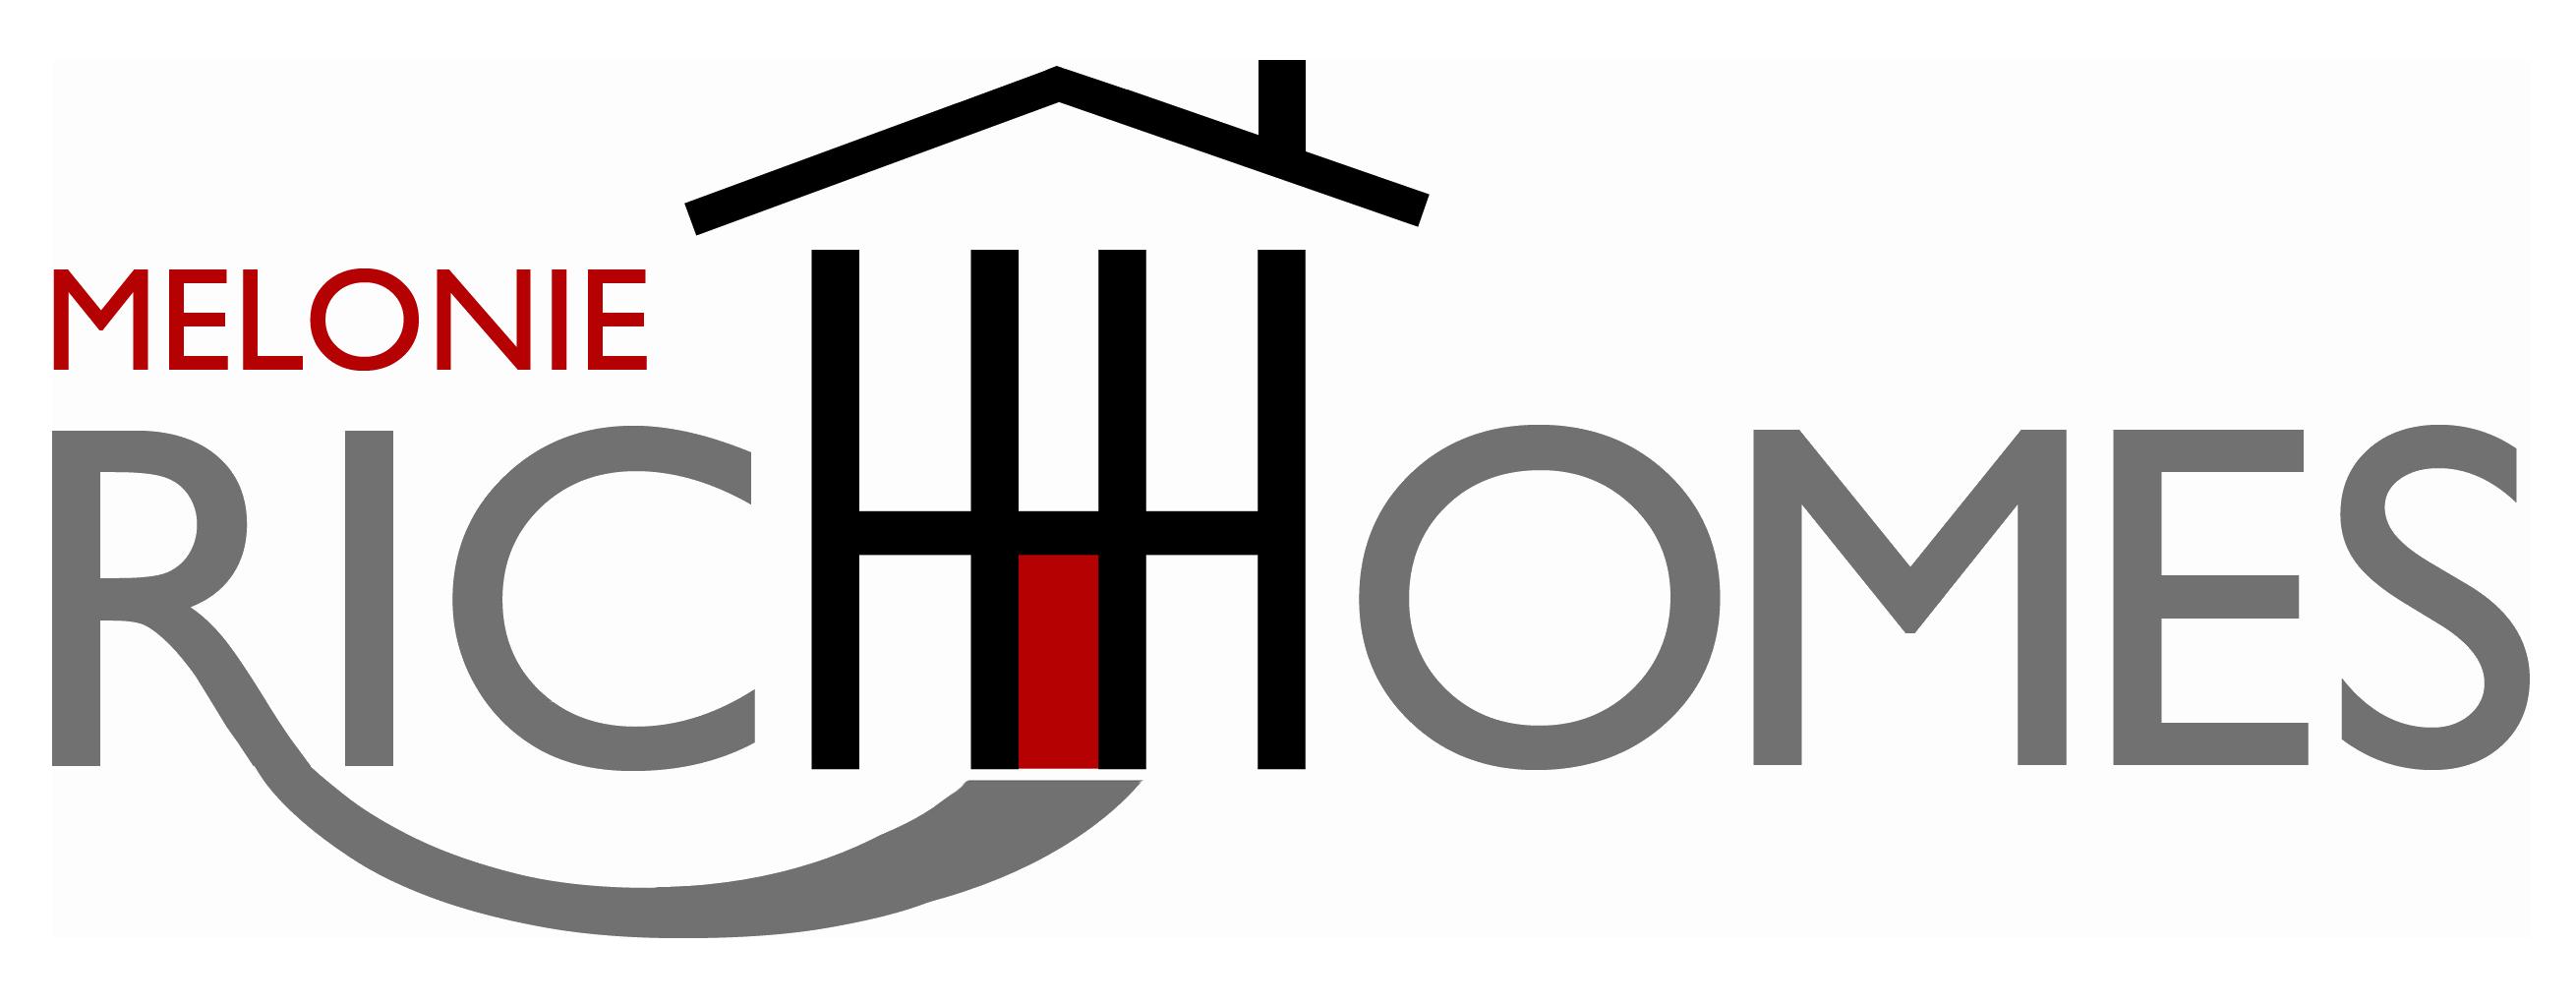 Melonie Rich Homes Logo